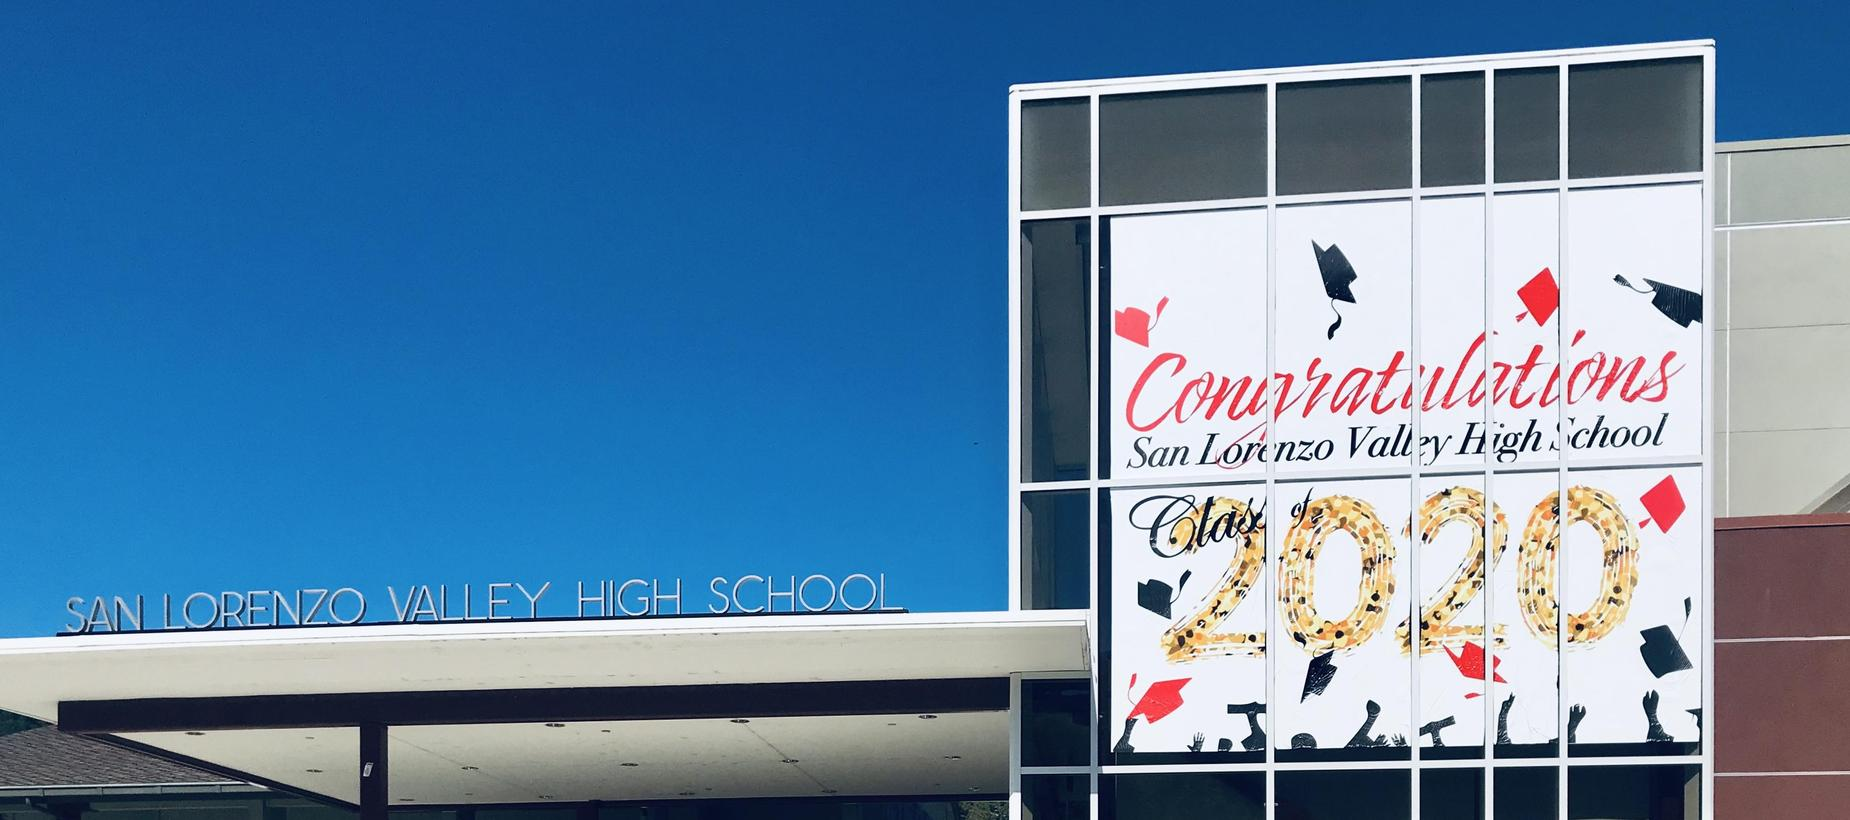 School building and billboard